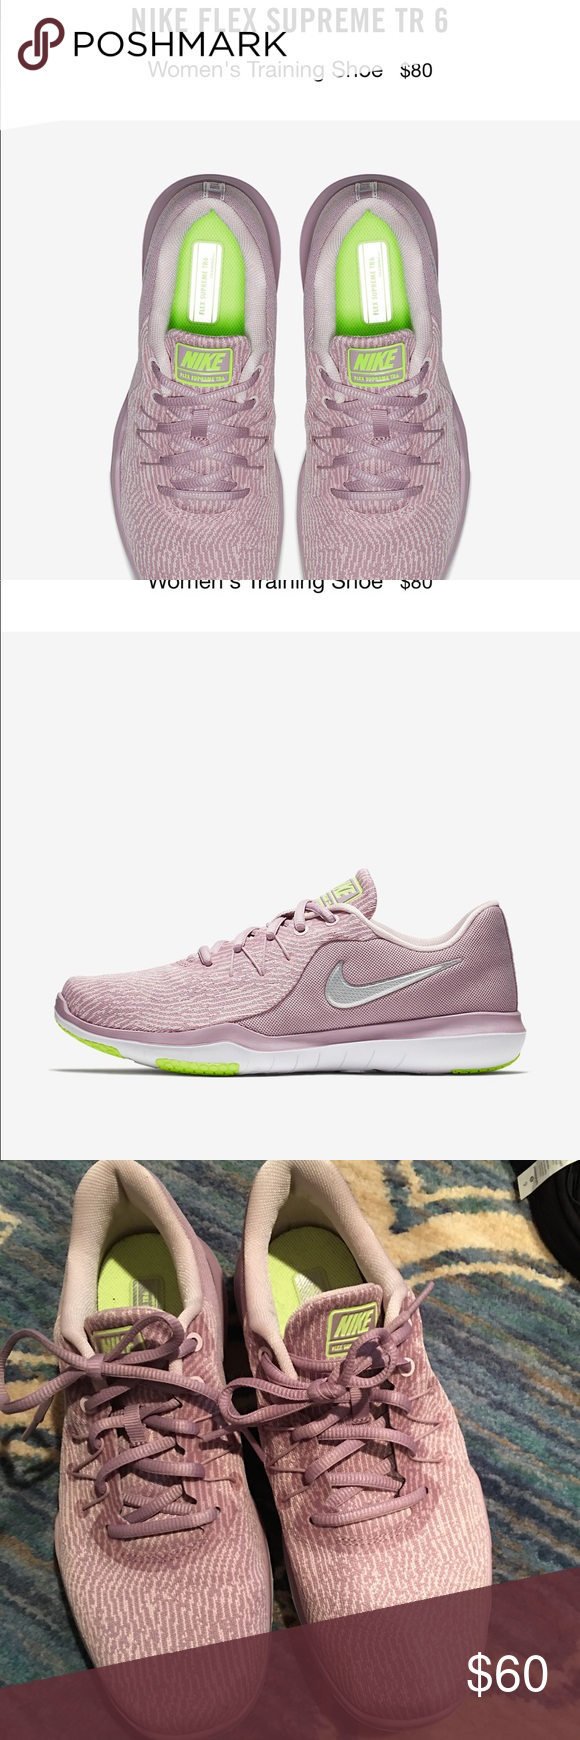 fb12fc61399 Nike sneakers Worn once Nike flex supreme TR6 sneakers. Beautiful blush  color